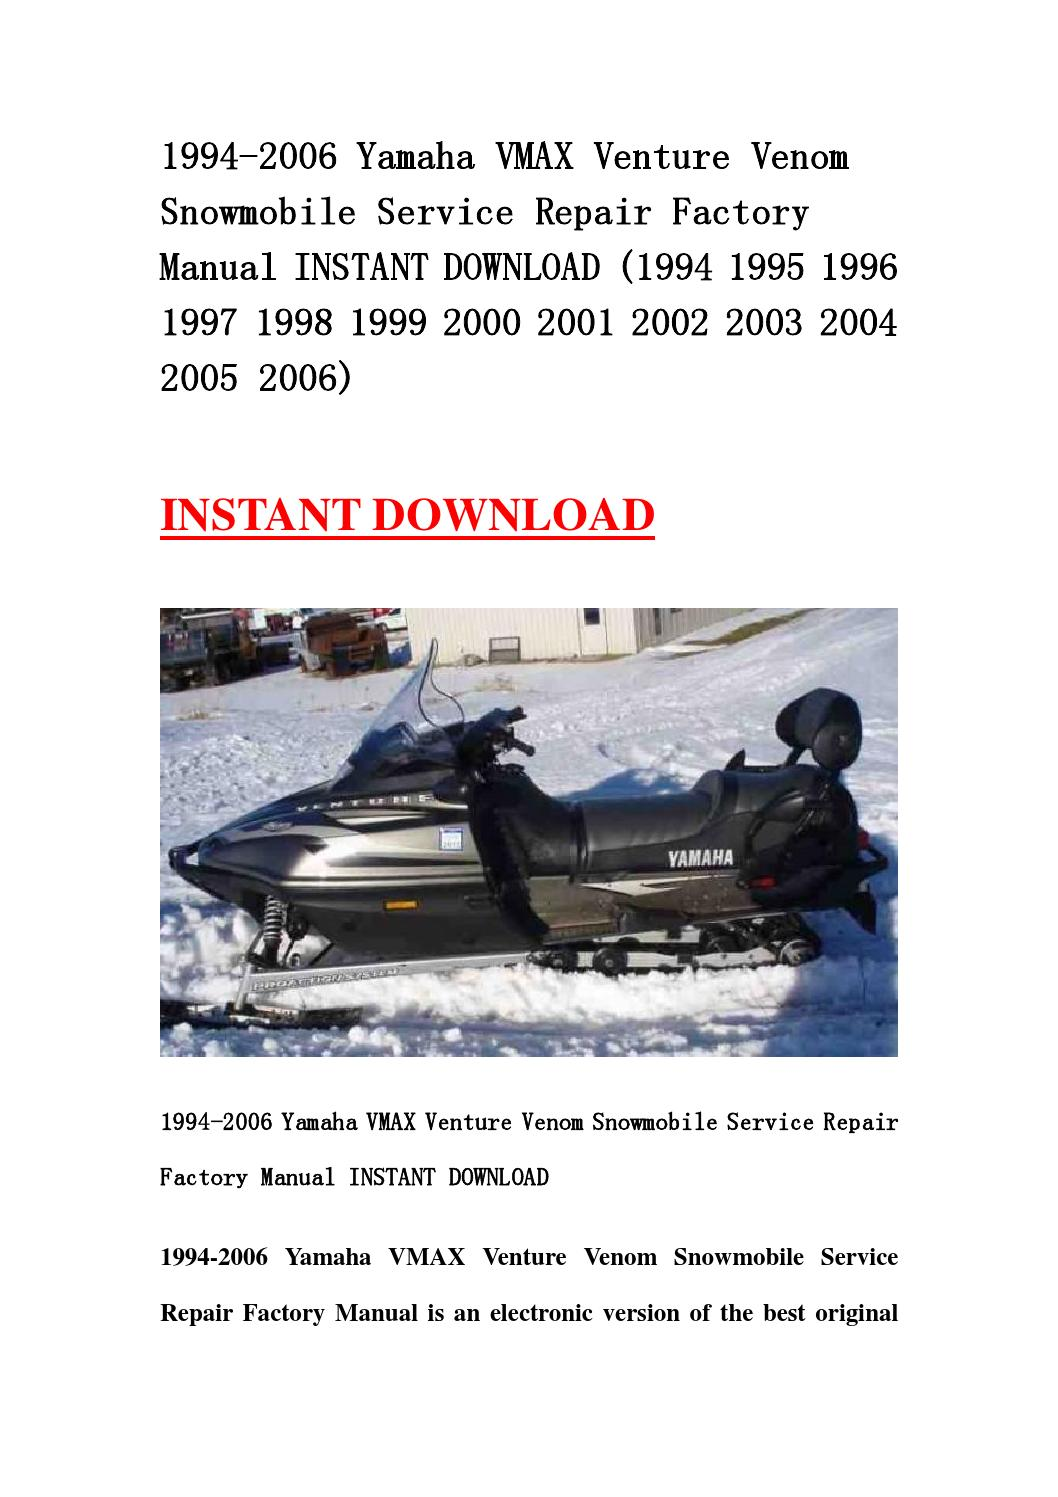 1994 2006 yamaha vmax venture venom snowmobile service repair factory manual  instant download (1994 by ksejfnhse - issuu